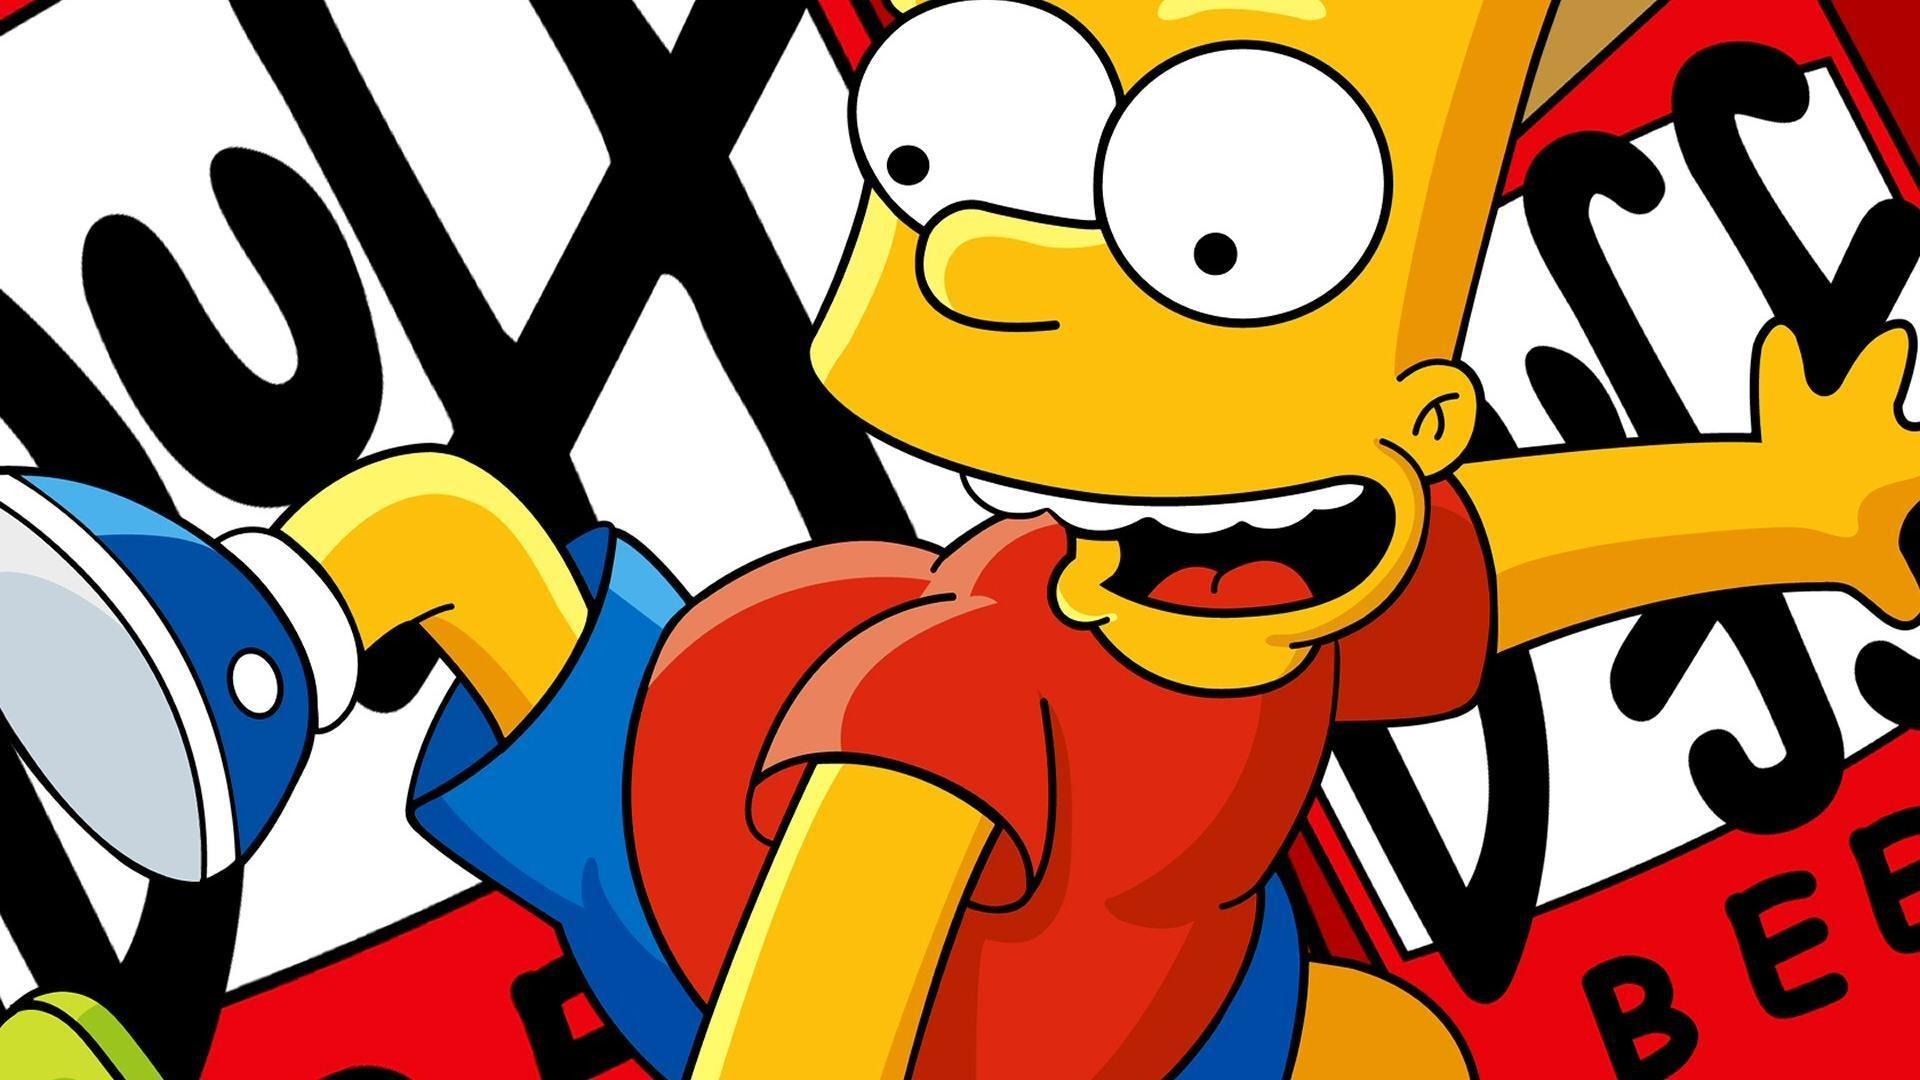 Обои На Телефон Андроид Симпсоны